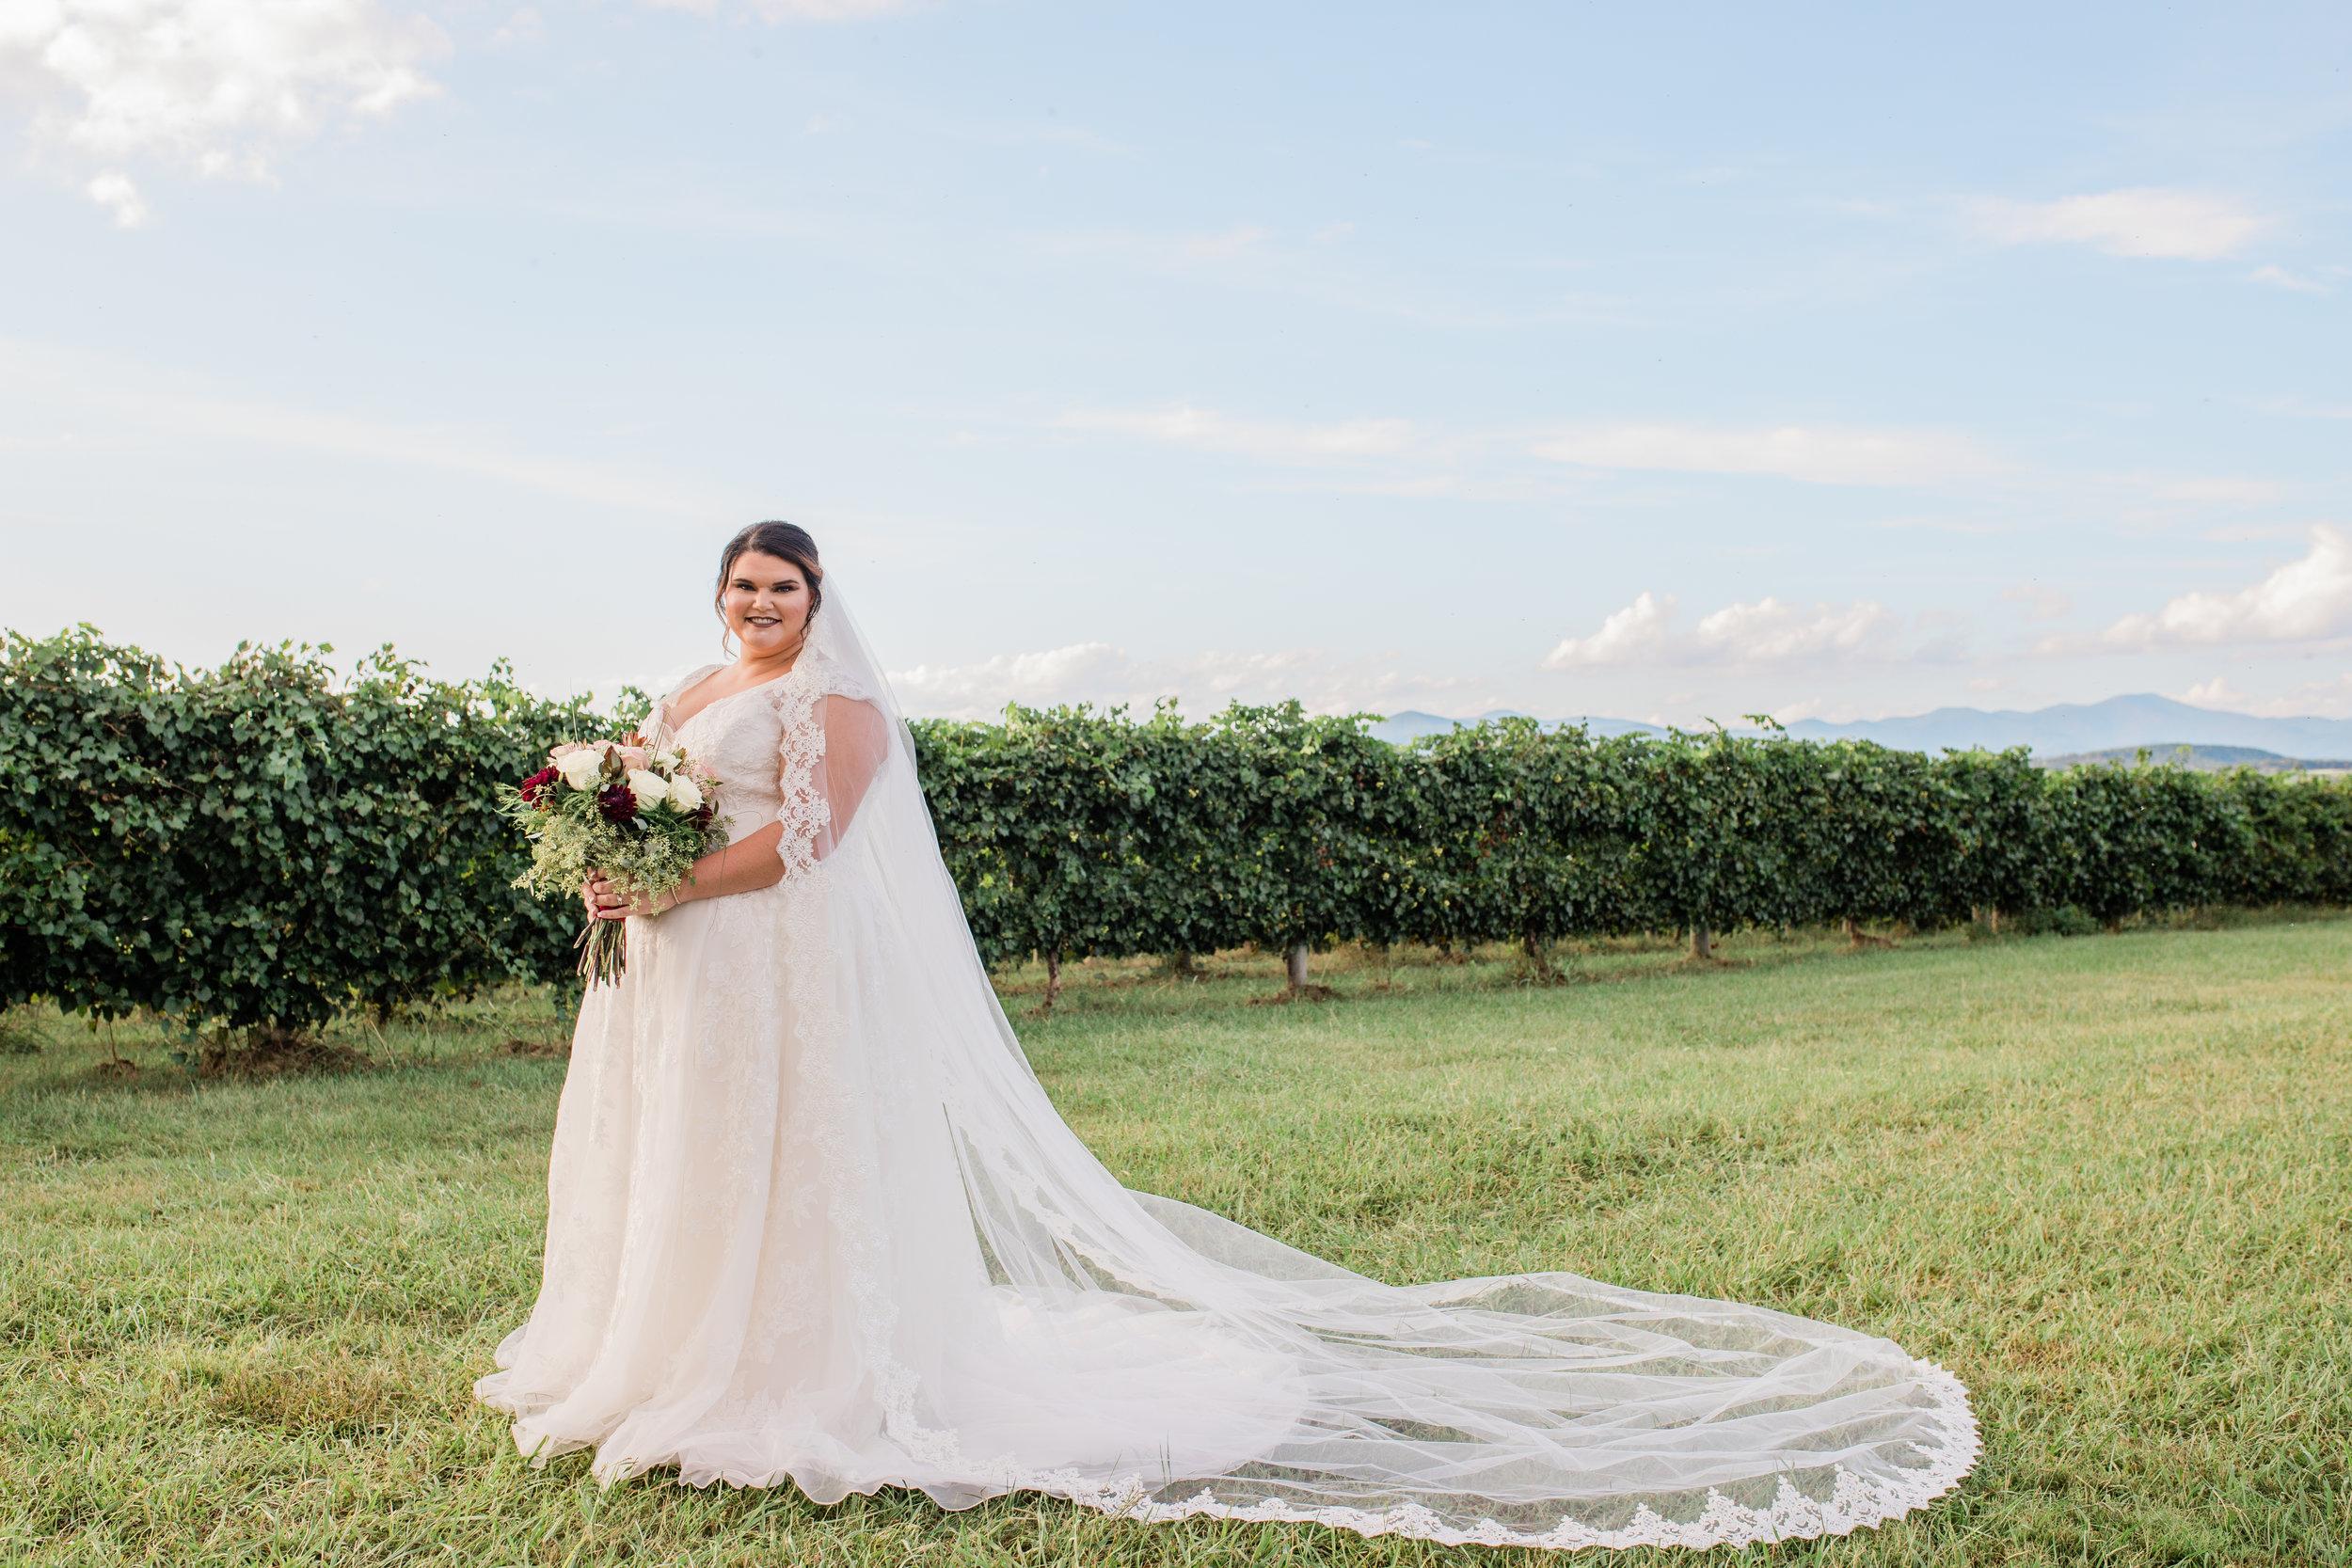 Brandi's Bridal Portraits at Chattooga Belle Farm | Palmetto State Weddings